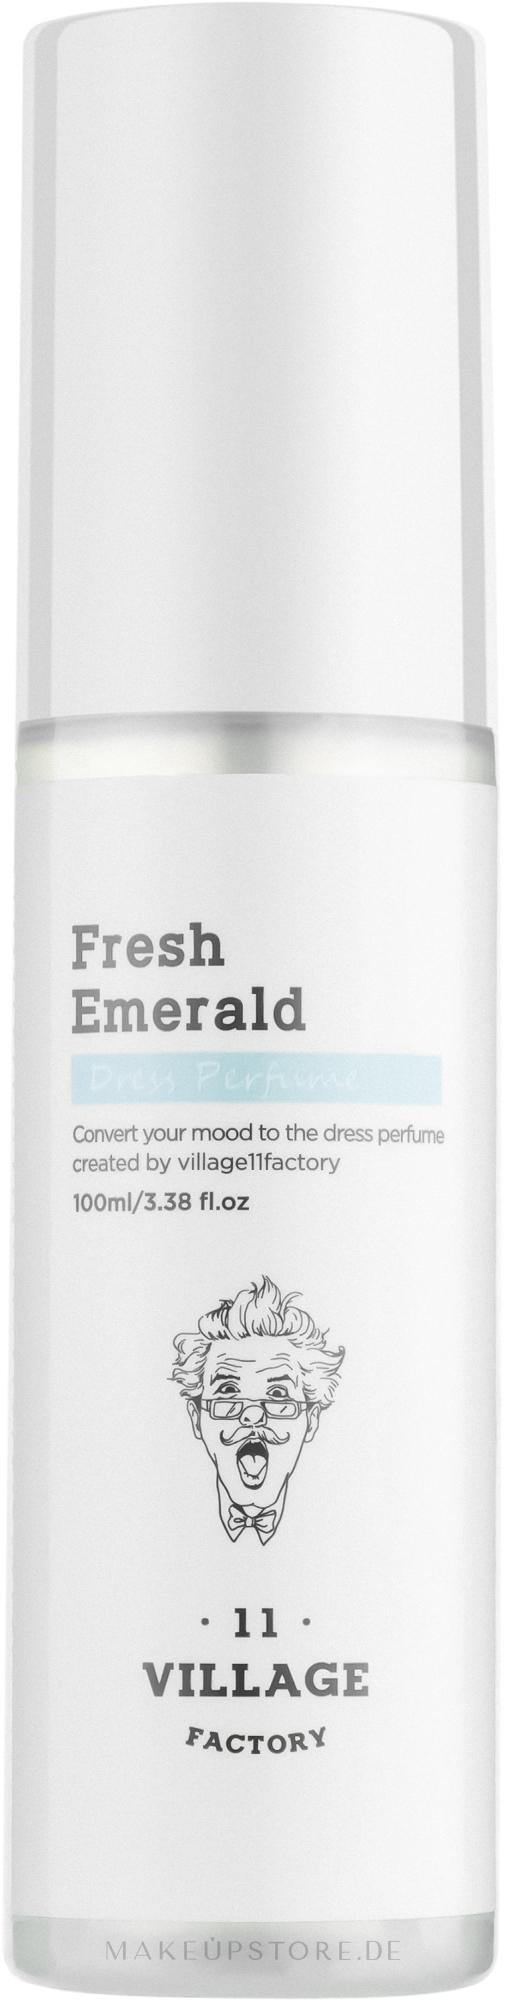 Village 11 Factory Dress Perfume Fresh Emerald - Parfümierter Textilerfrischer Fresh Emerald  — Bild 100 ml